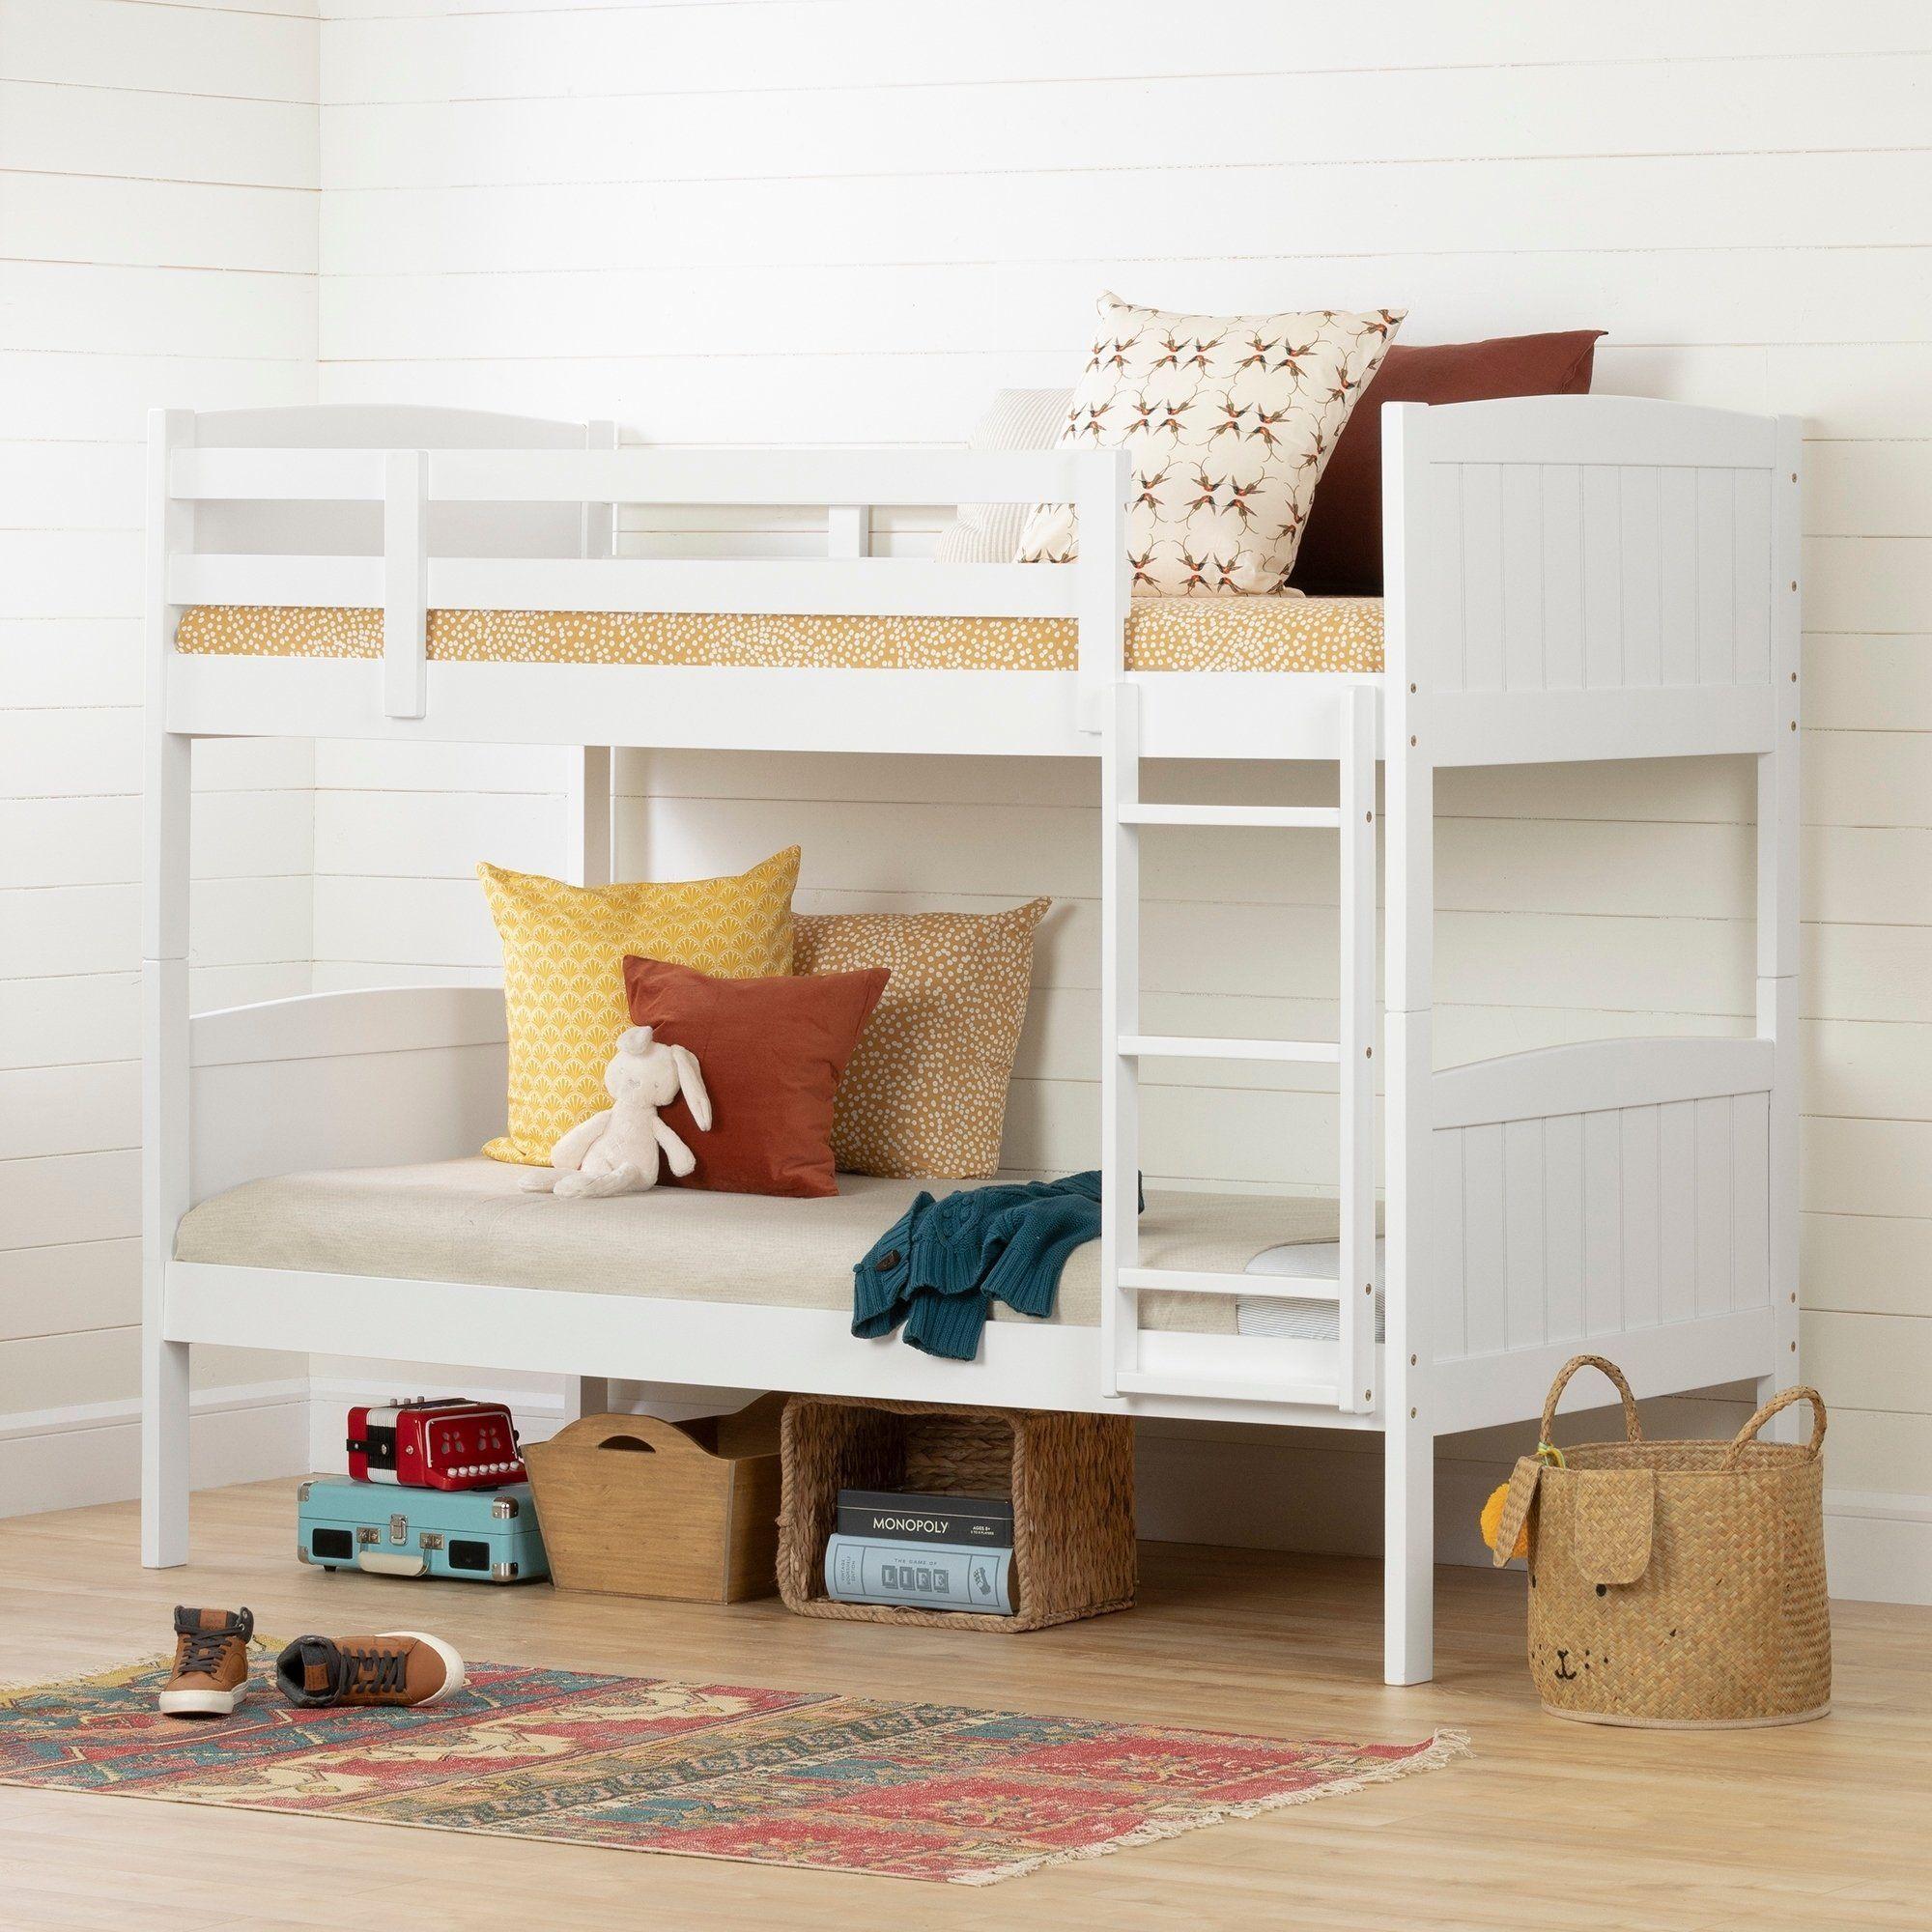 South Shore Savannah Solid Wood Bunk Beds Kids Unisex White